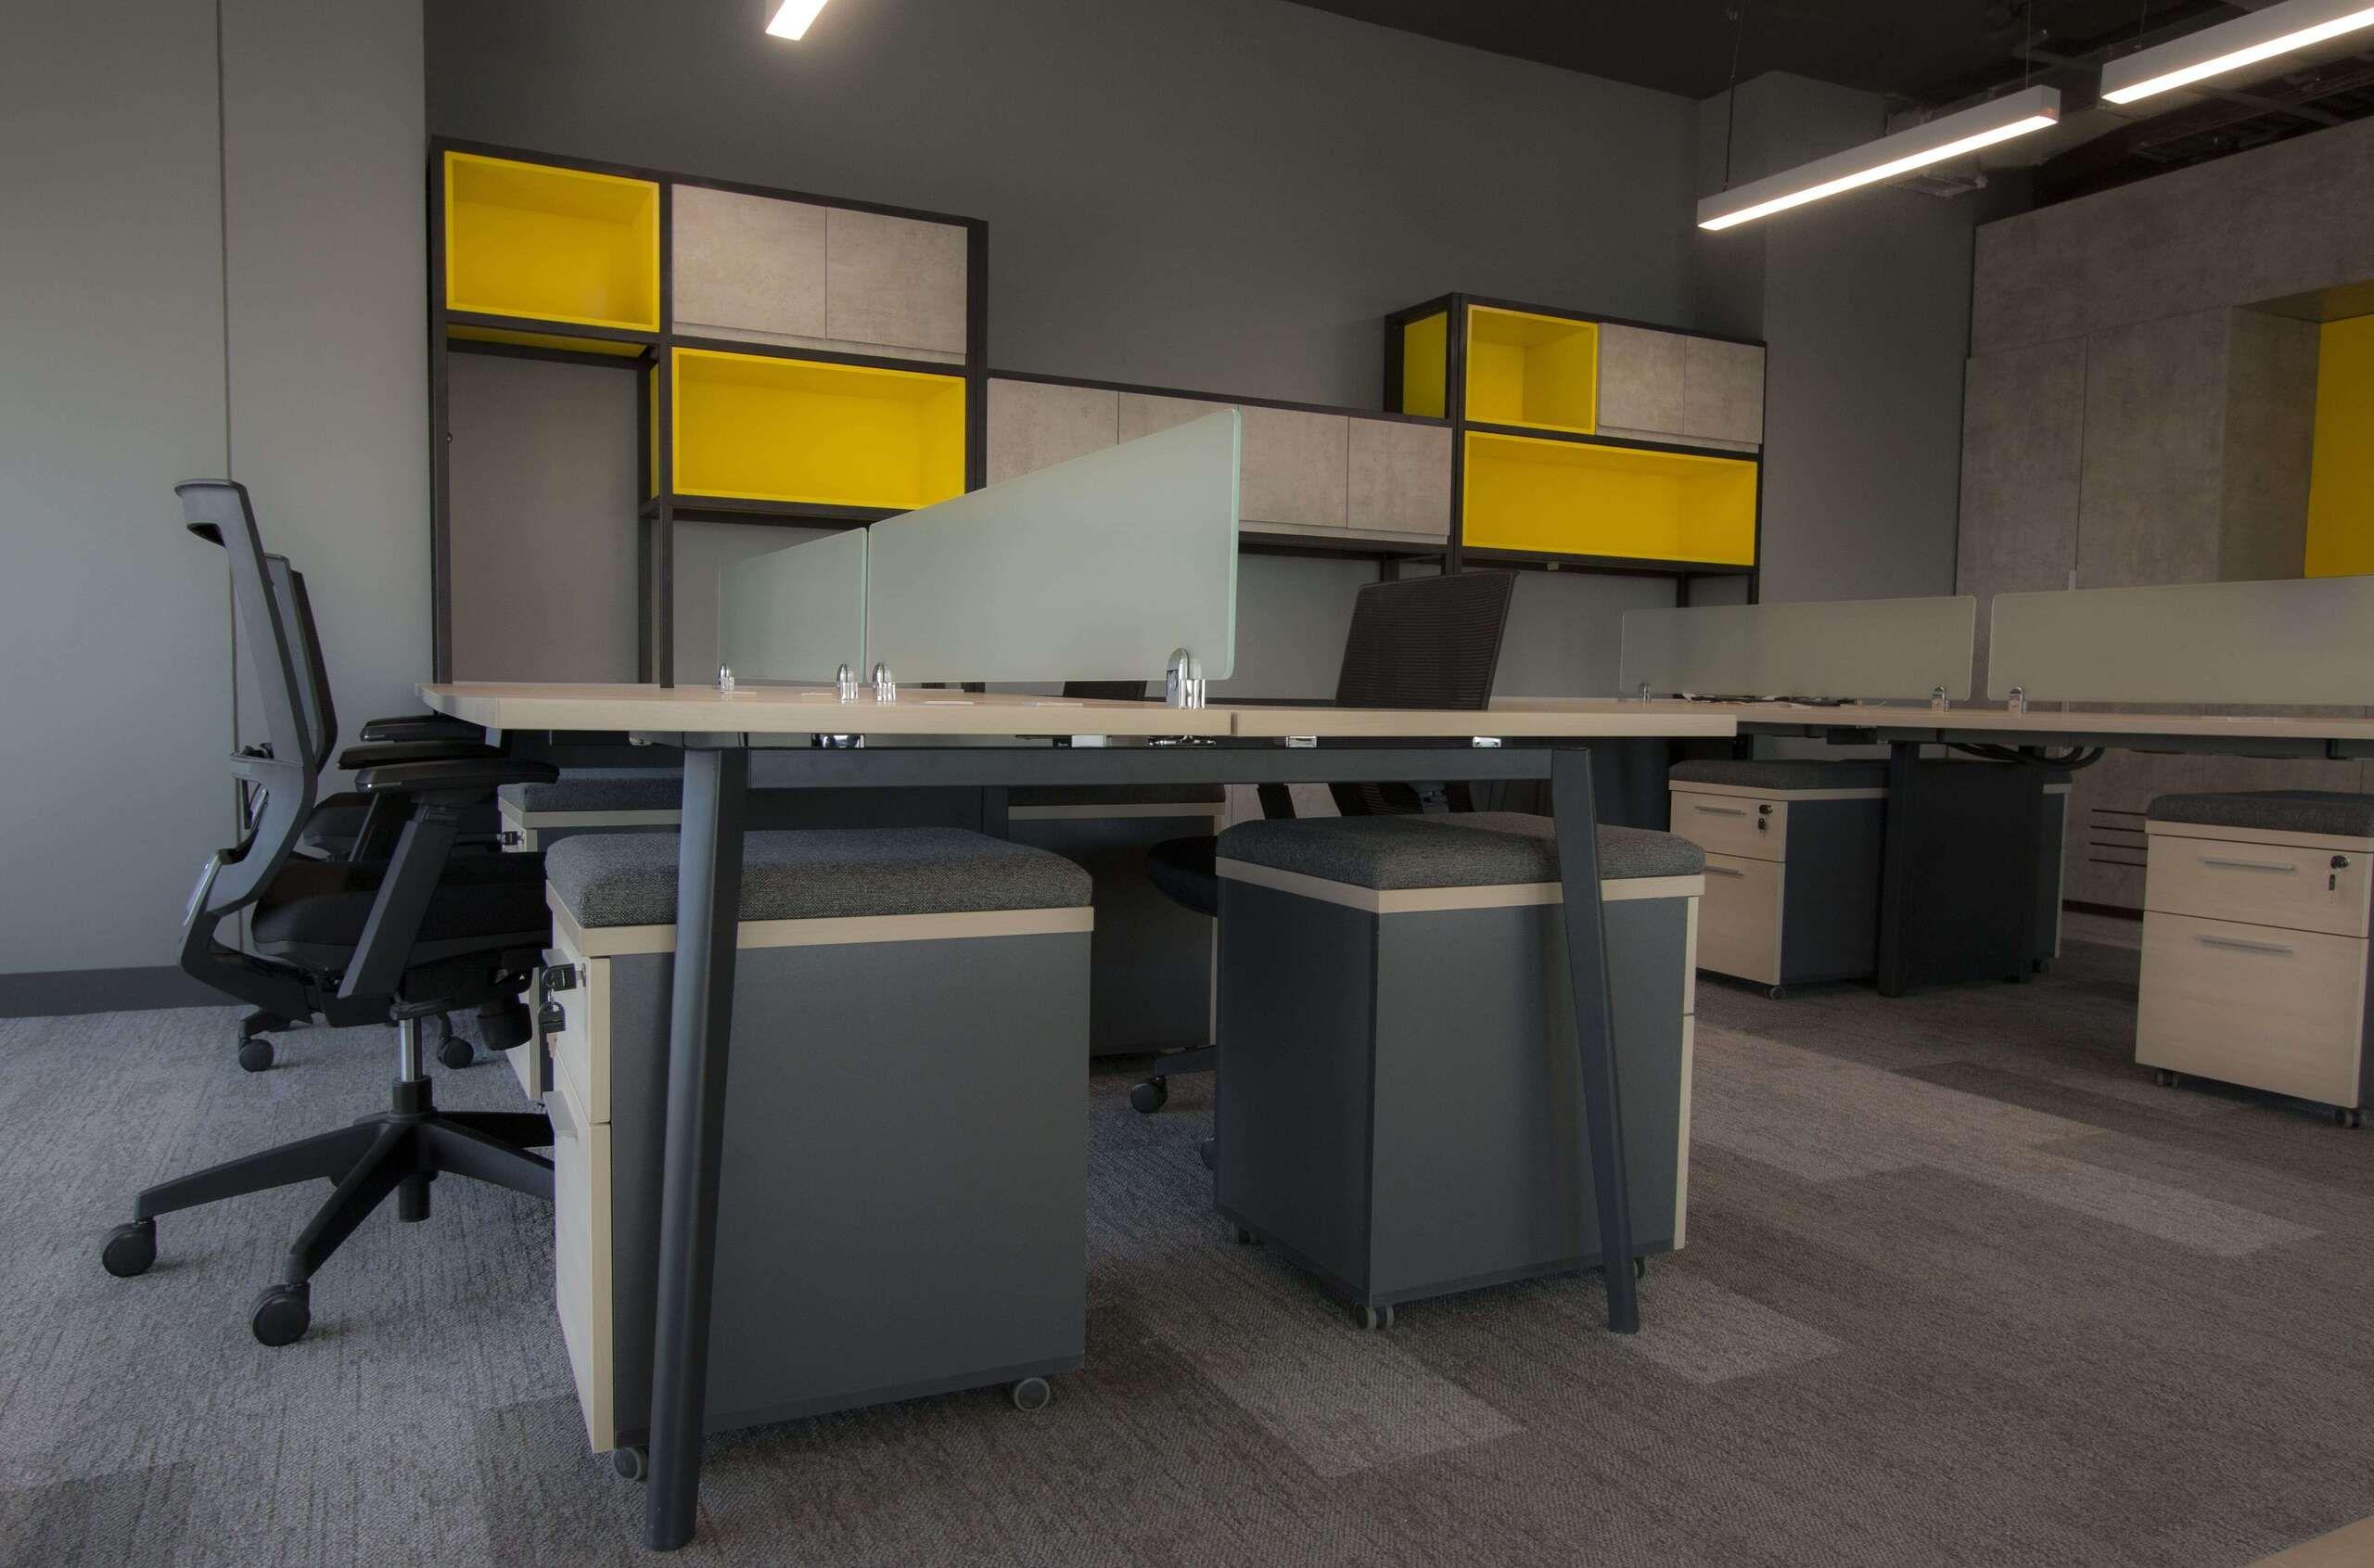 A3 muebles de oficina tipo bench Santiago, Chile